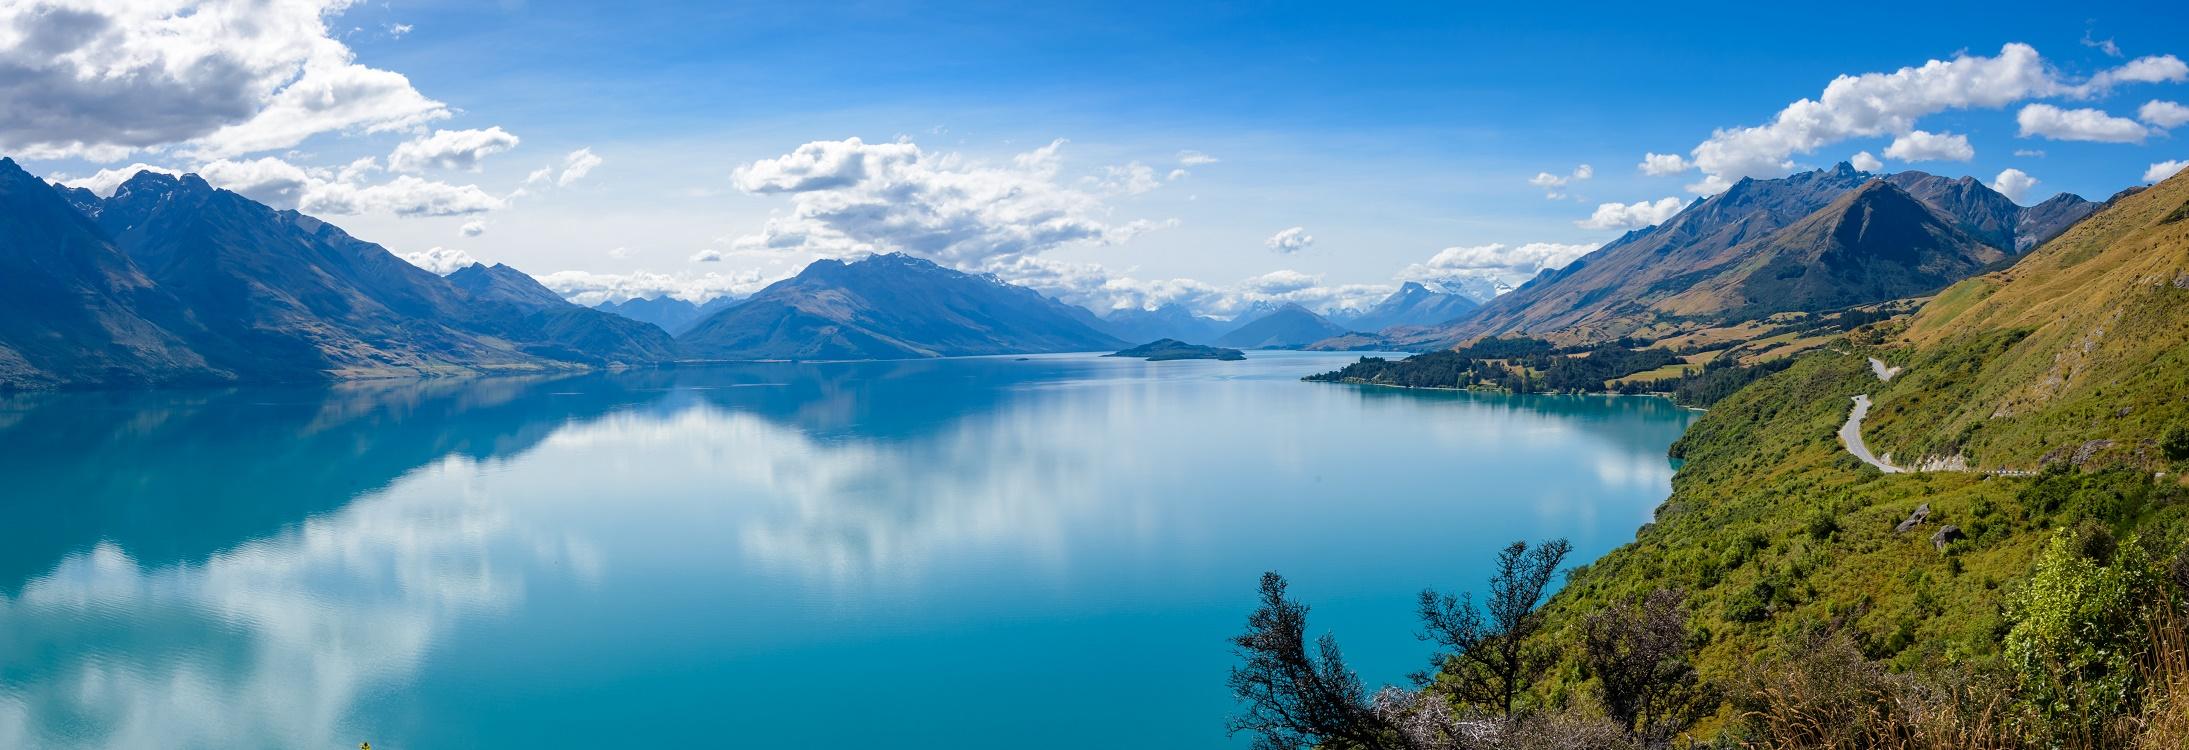 lake,nieuw zeeland